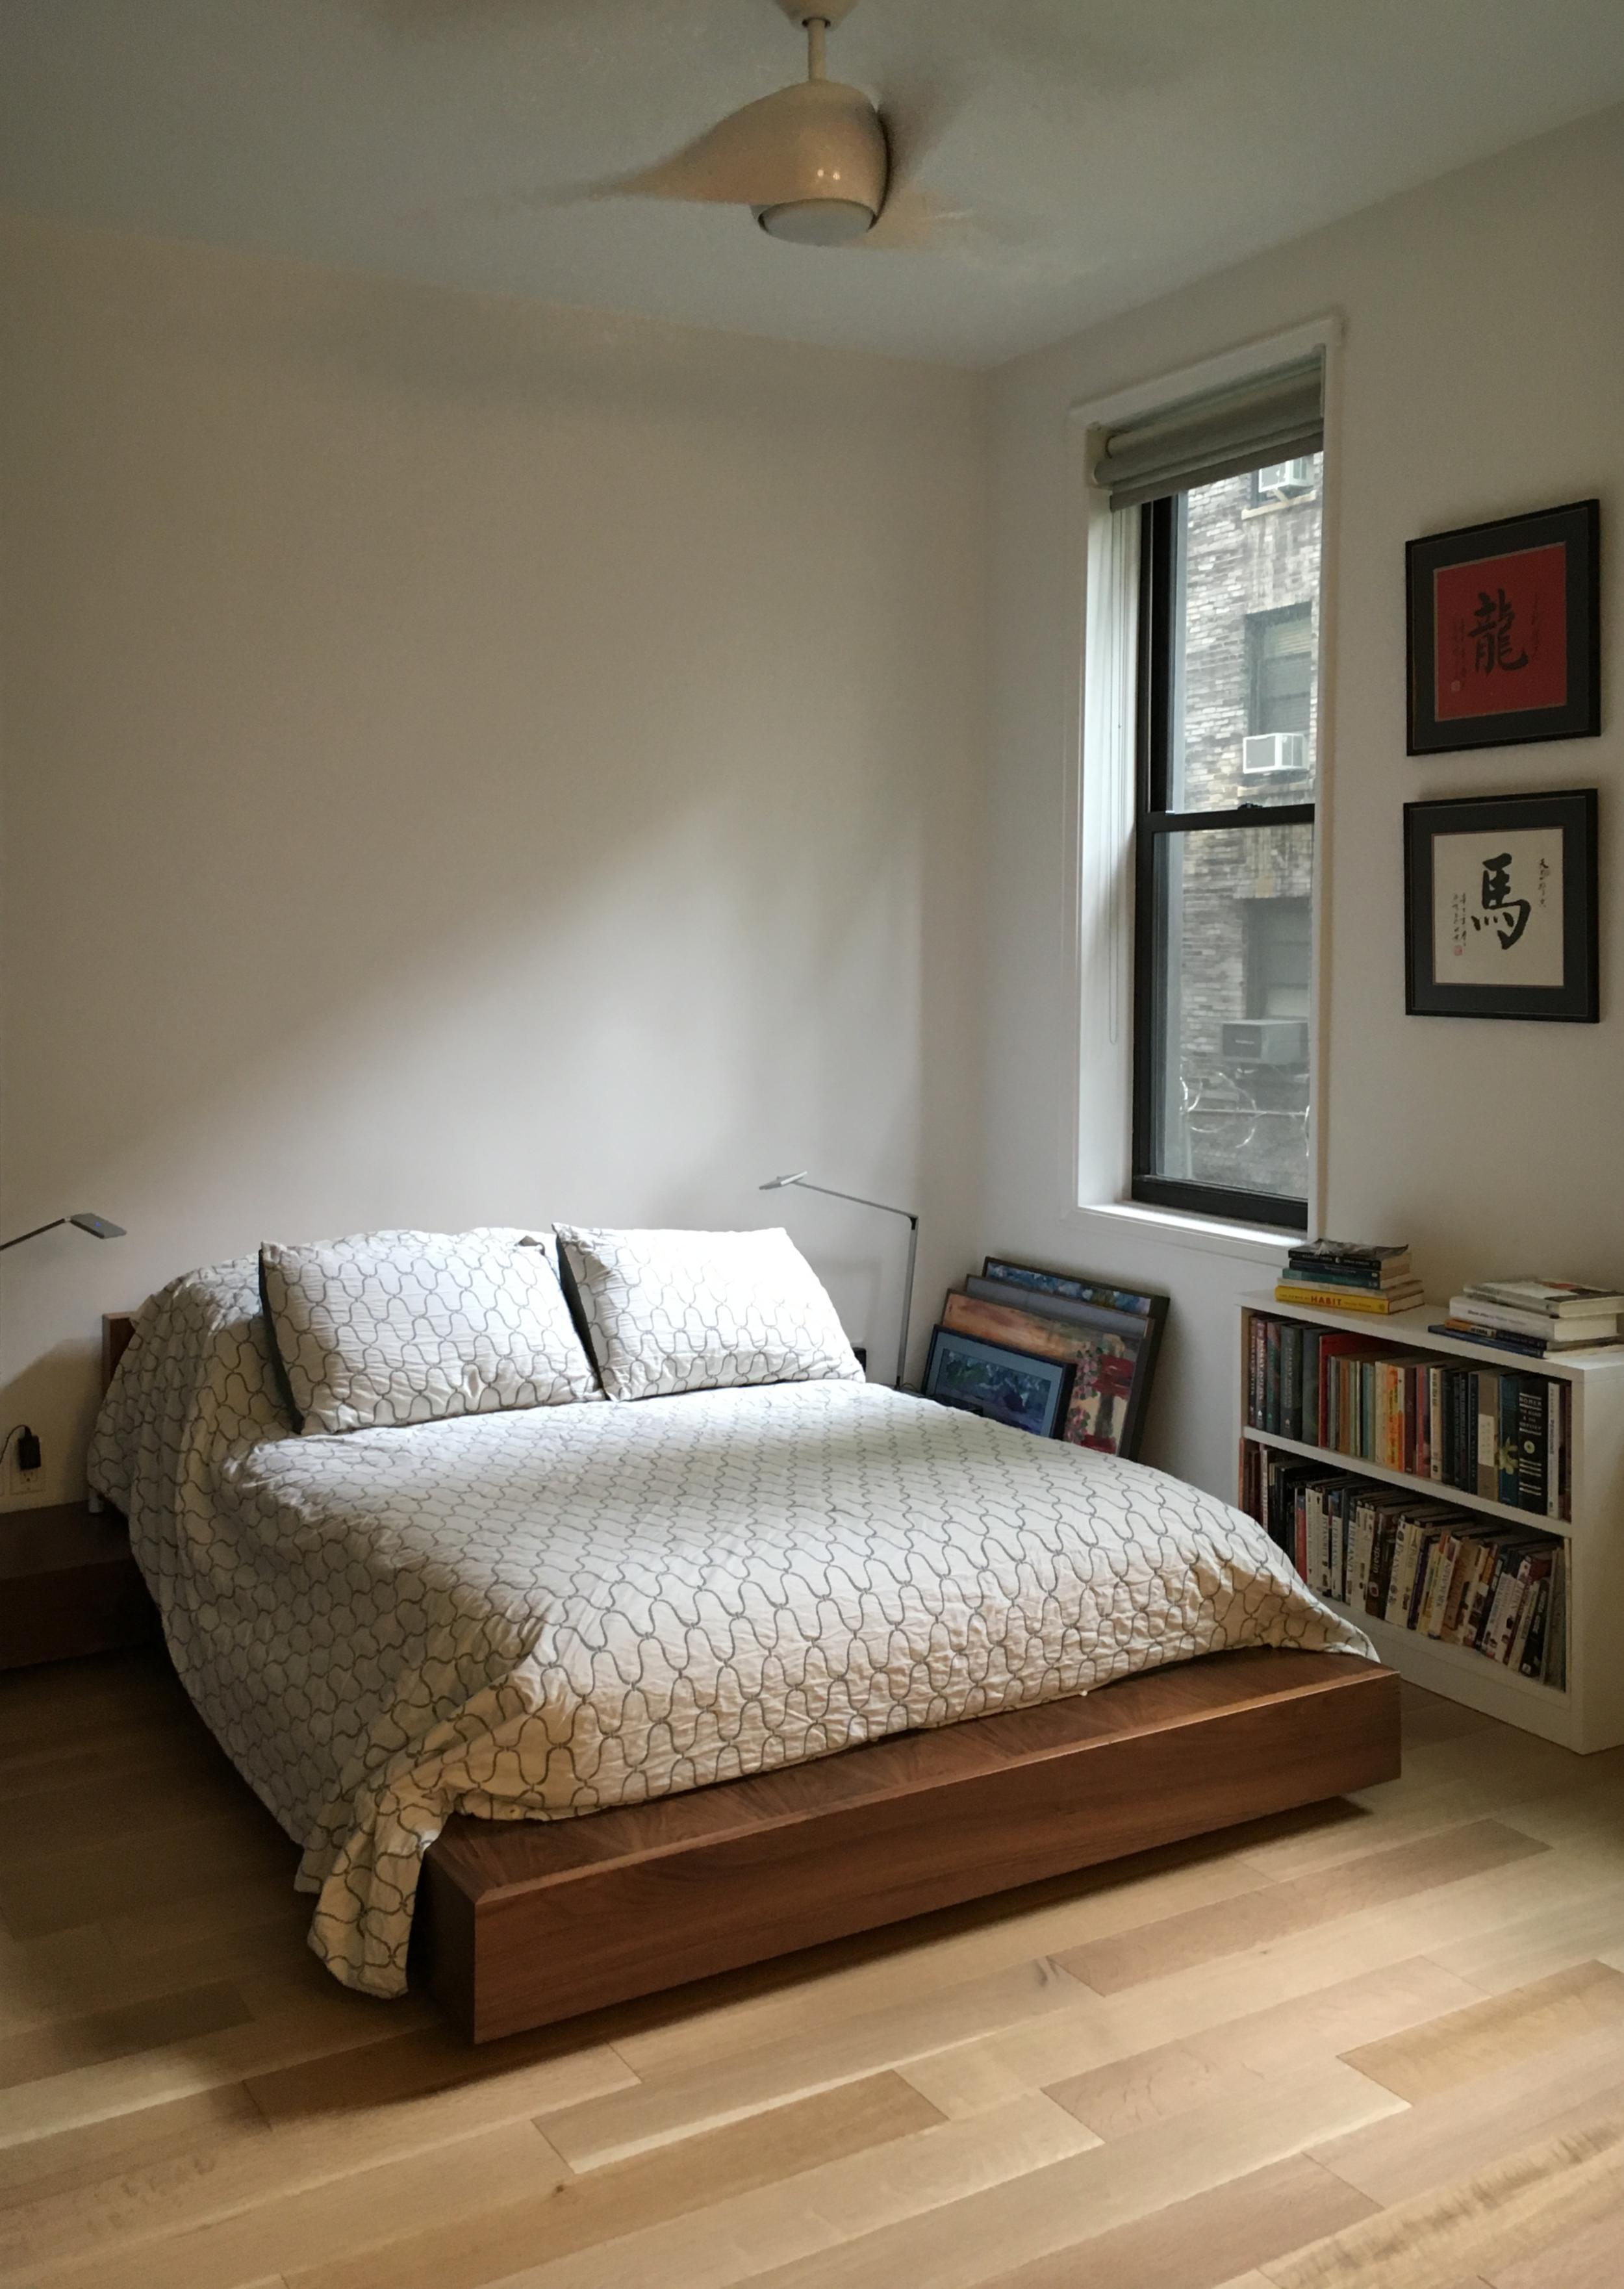 ApartmentNY (1).jpg